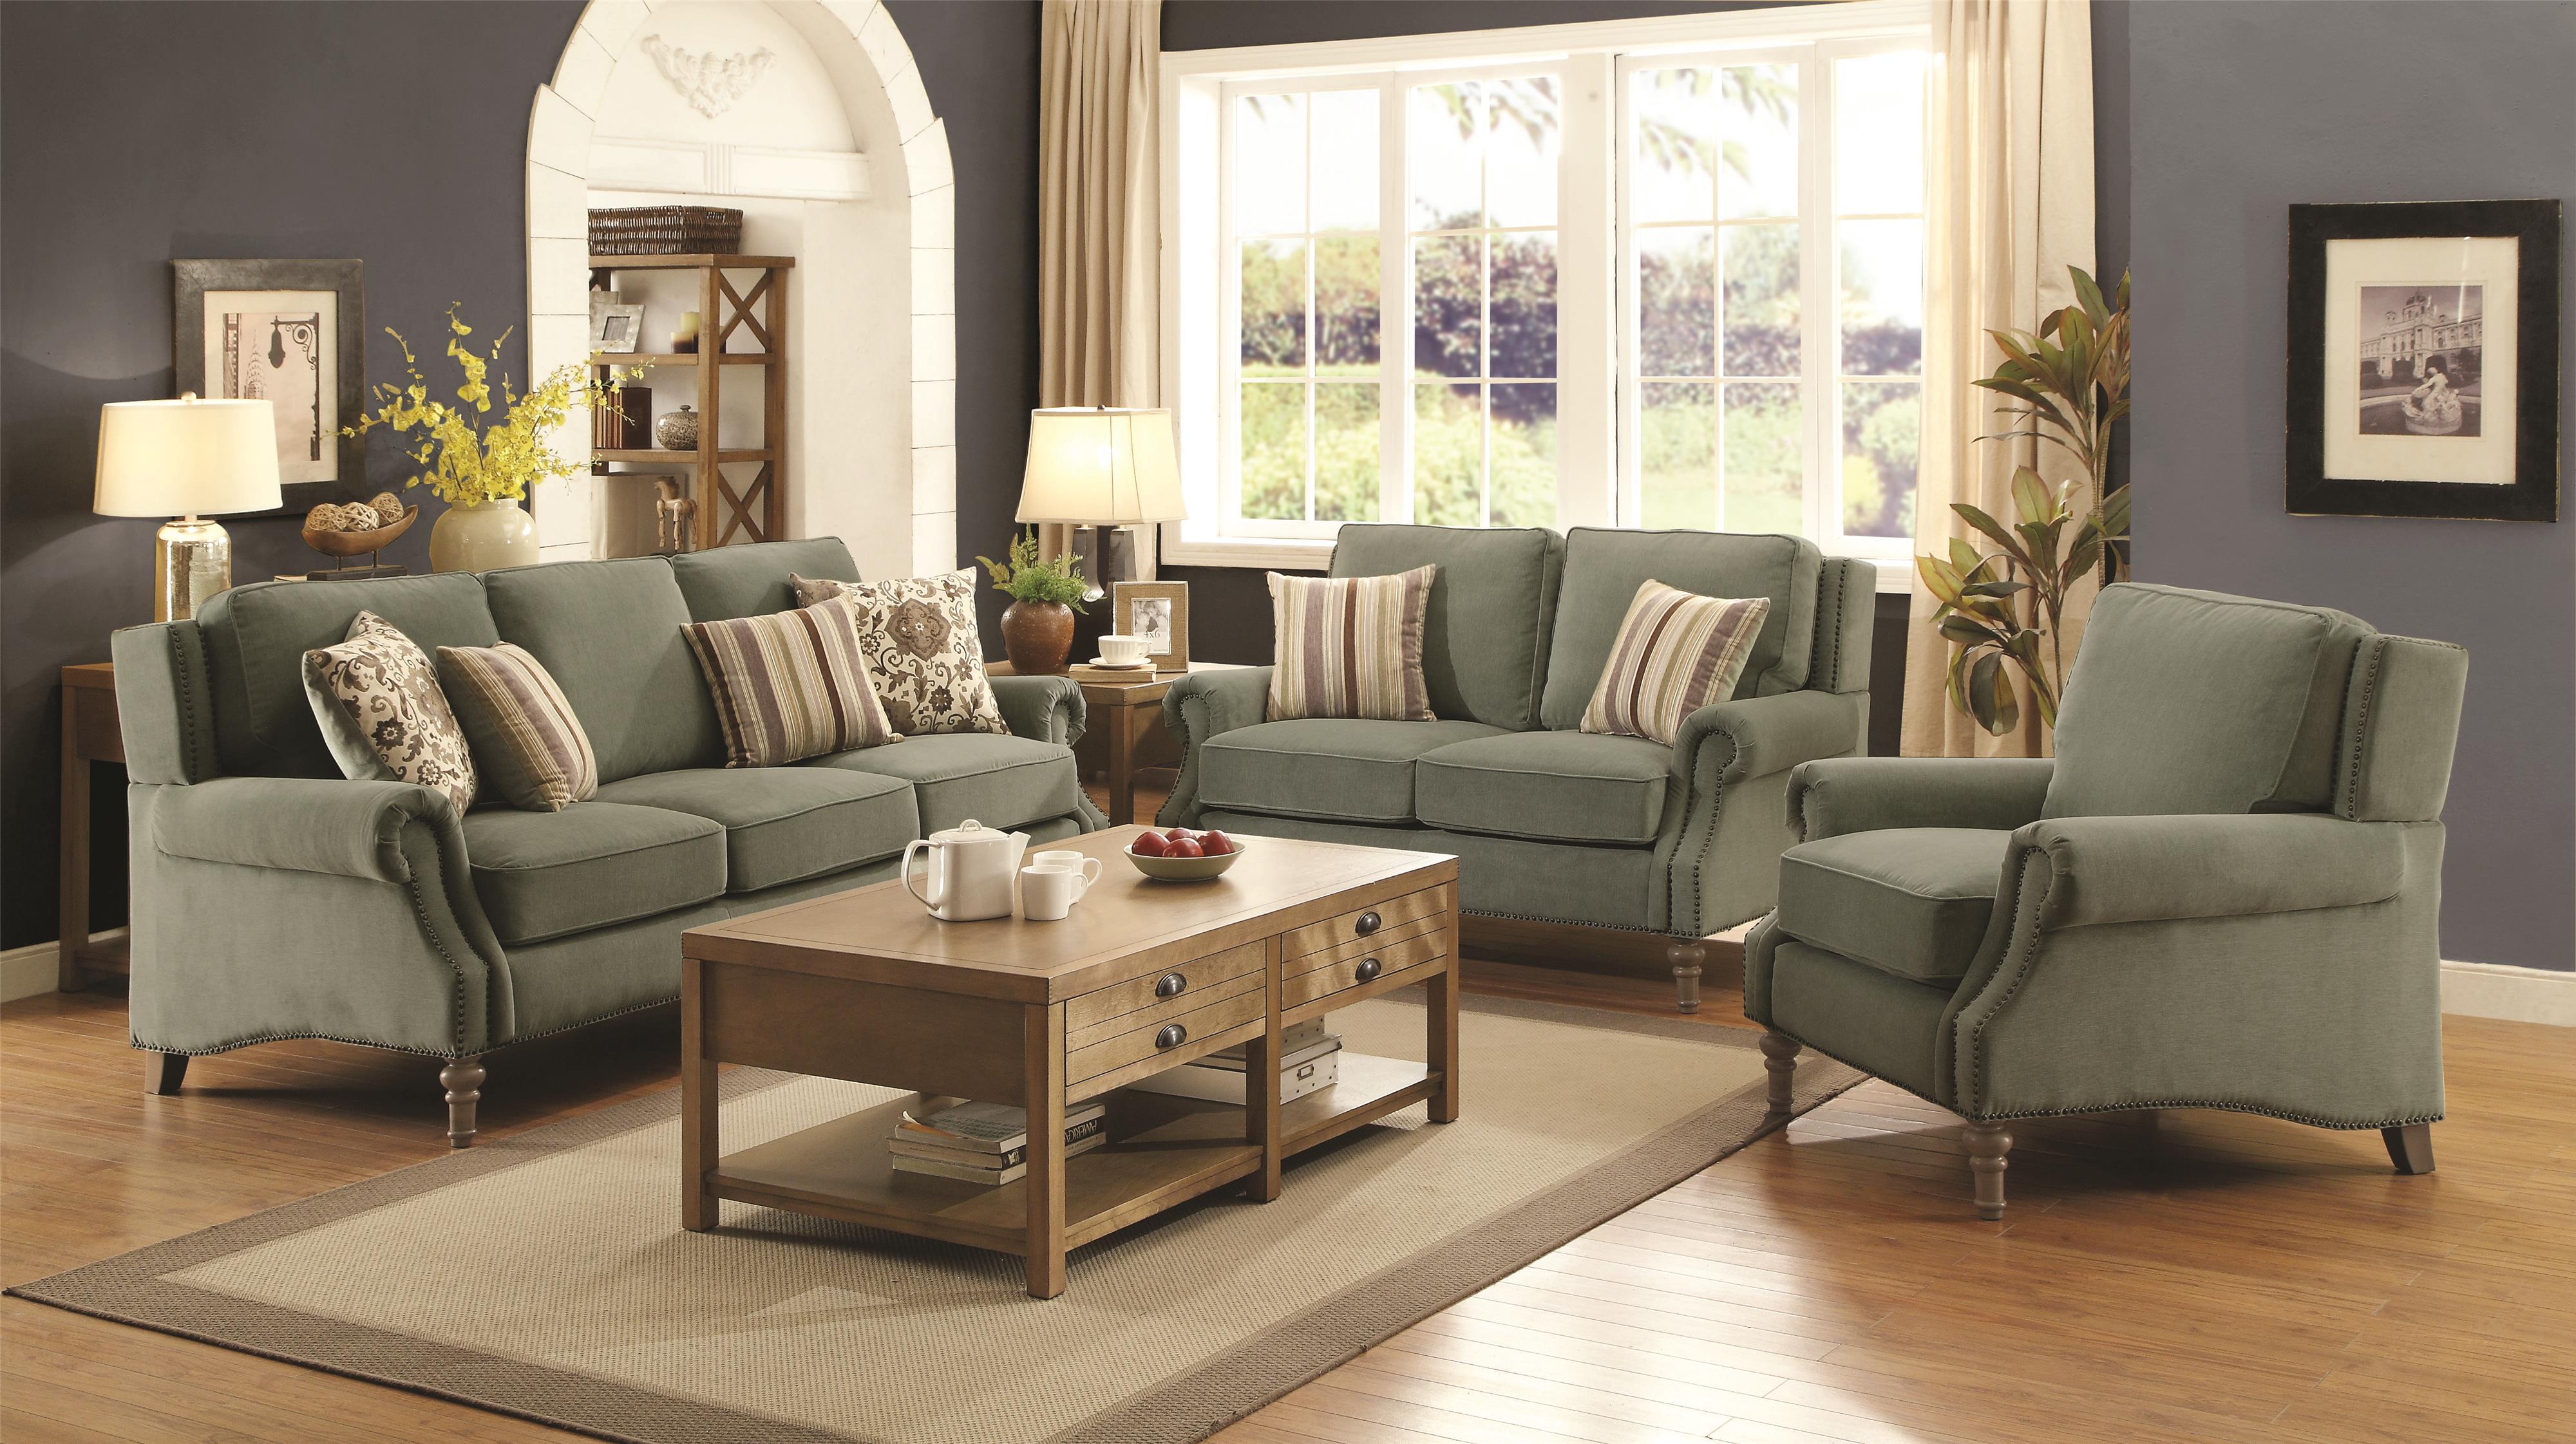 Coaster Rosenberg Living Room Group - Item Number: 50522 Living Room Group 1